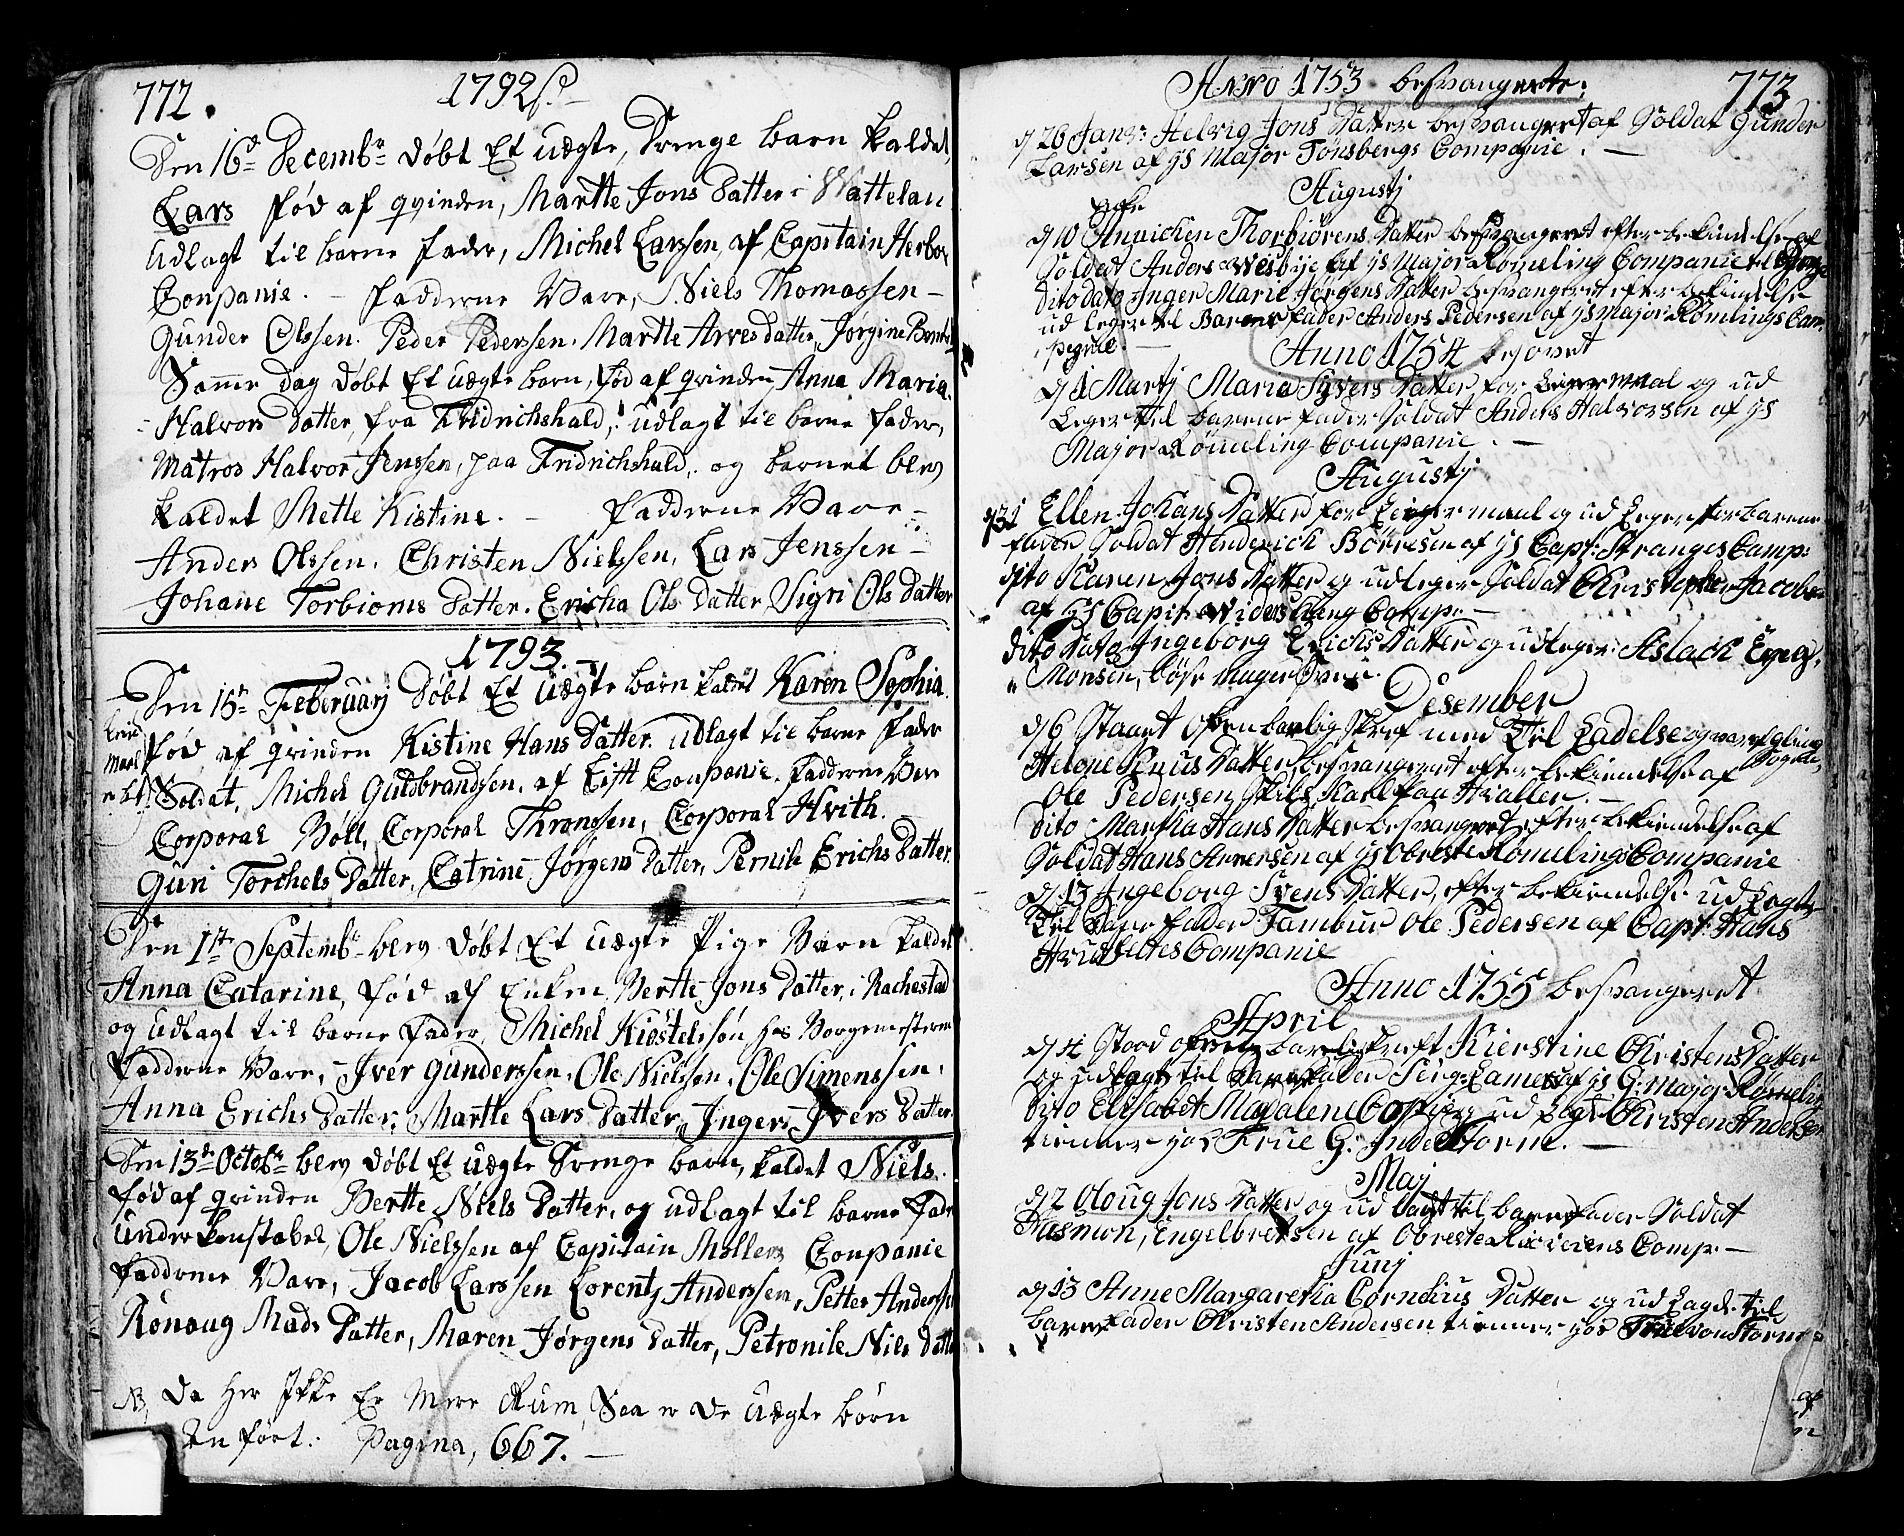 SAO, Fredrikstad prestekontor Kirkebøker, F/Fa/L0002: Ministerialbok nr. 2, 1750-1804, s. 772-773